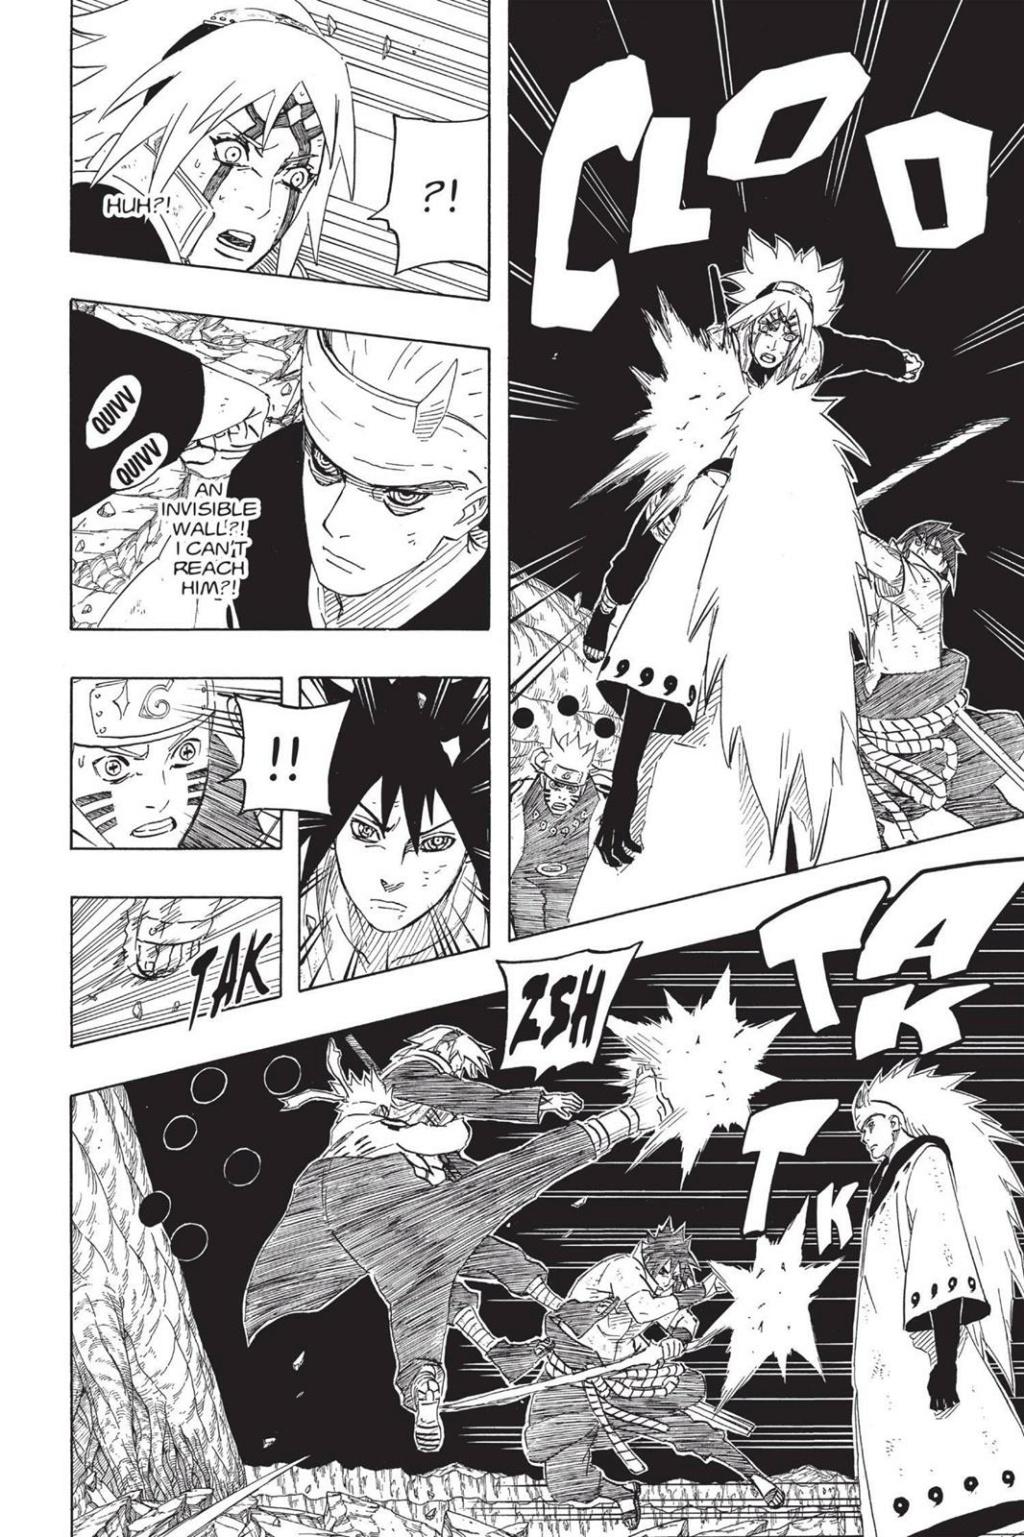 Sakura vs kinshiki - Página 8 0676-010